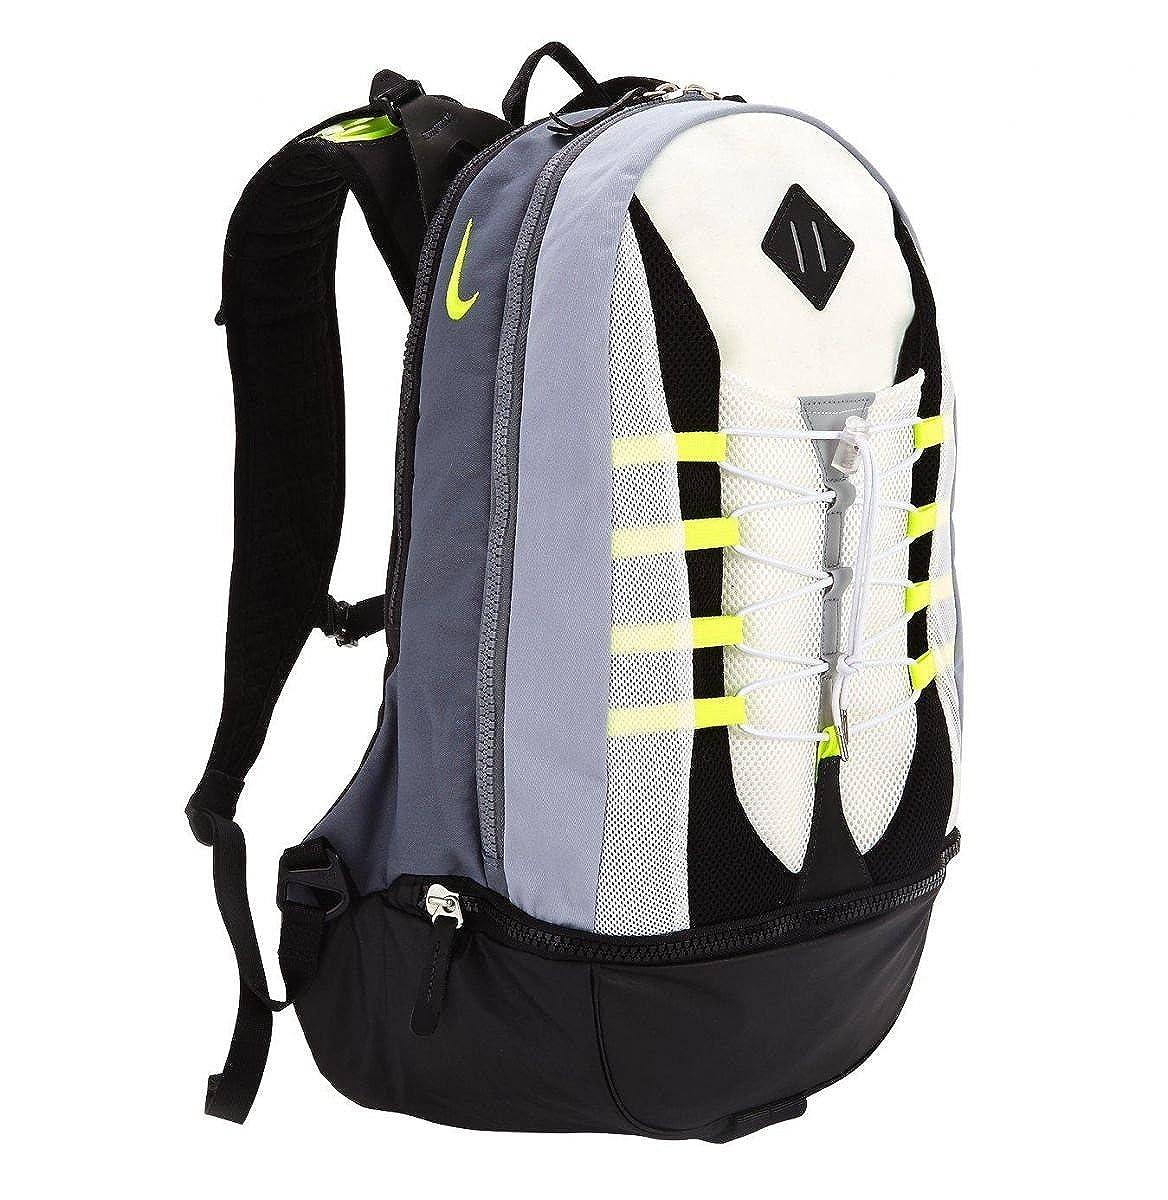 Air Max 95 Pursuit Backpack エアマックス95 バックパック B00VOC6IXG